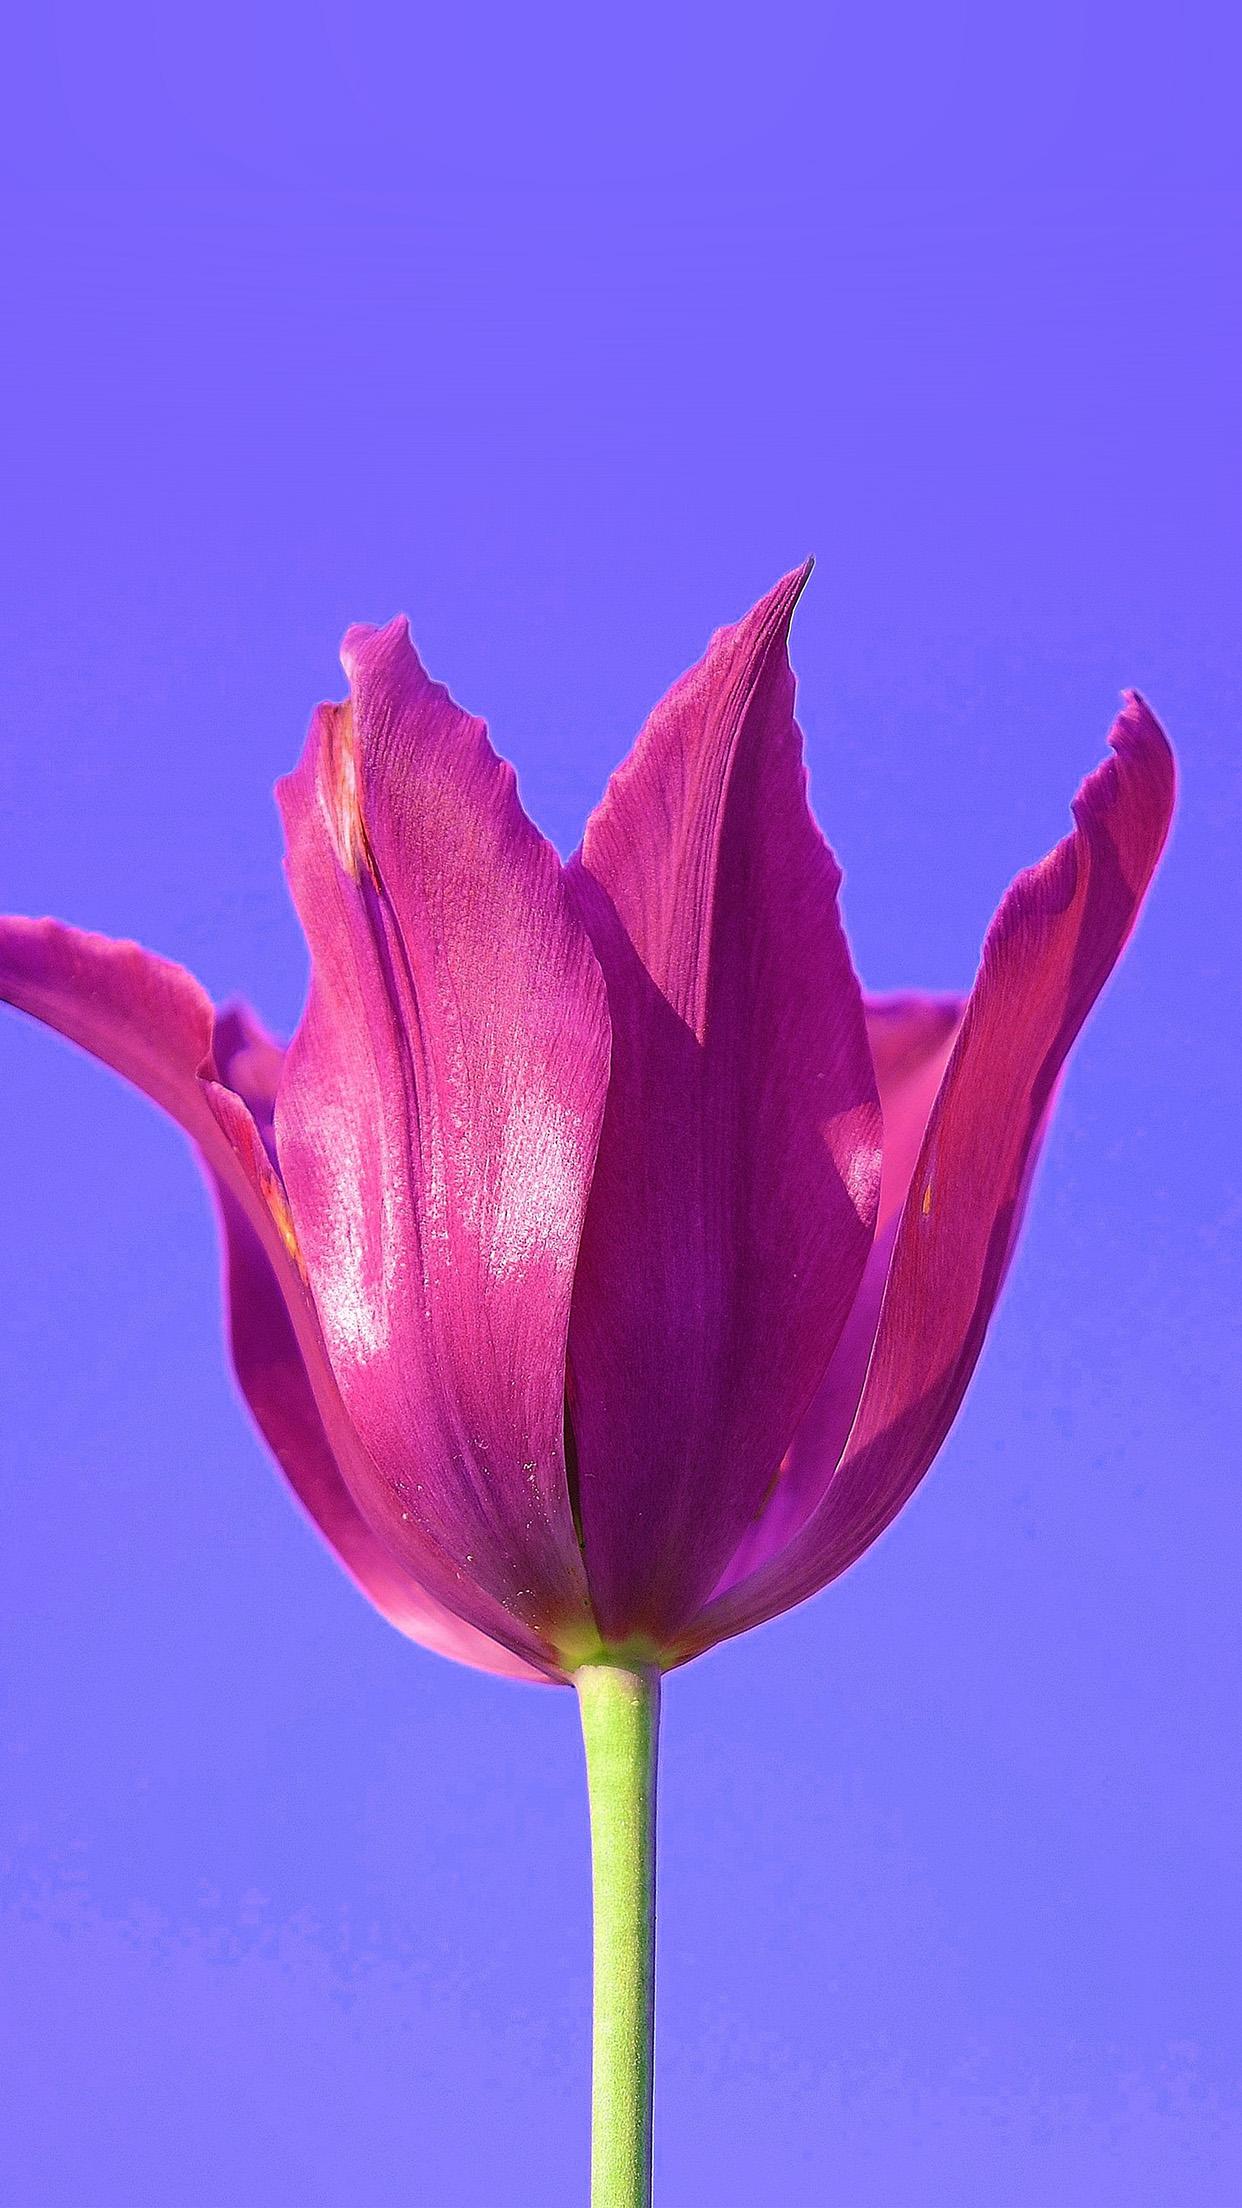 nk37-flower-art-minimal-purple-red-nature